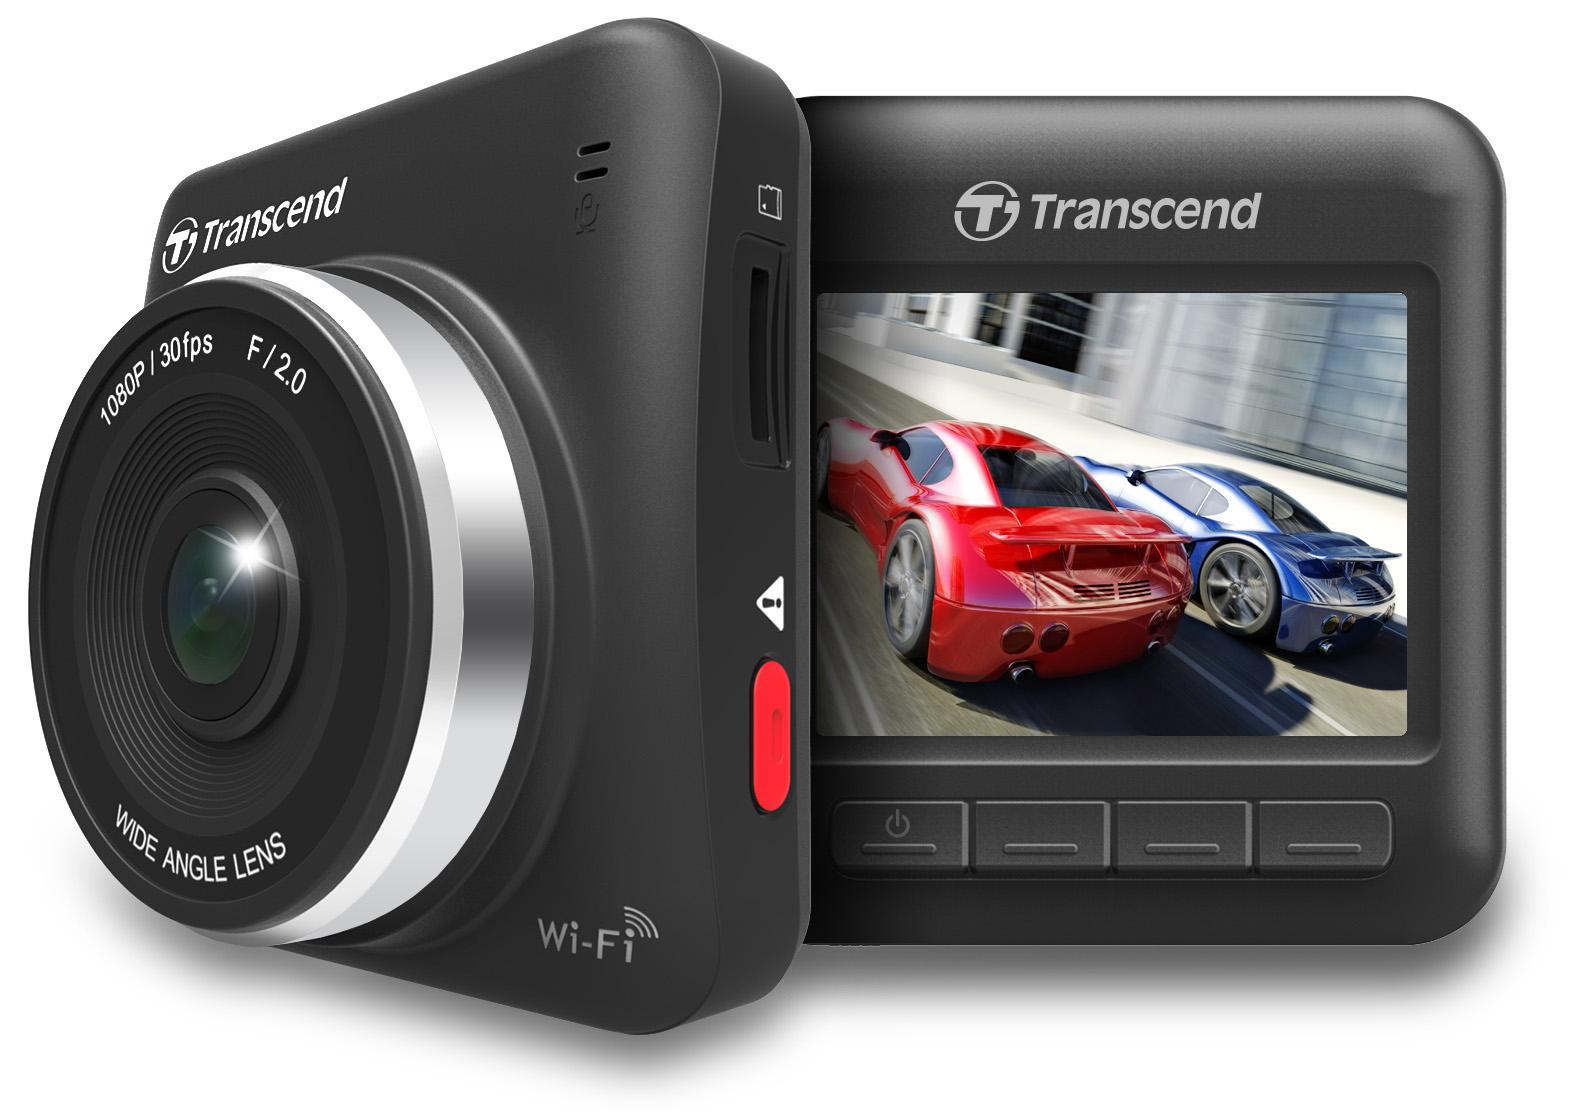 Transcend Dashcam DrivePro Dp200